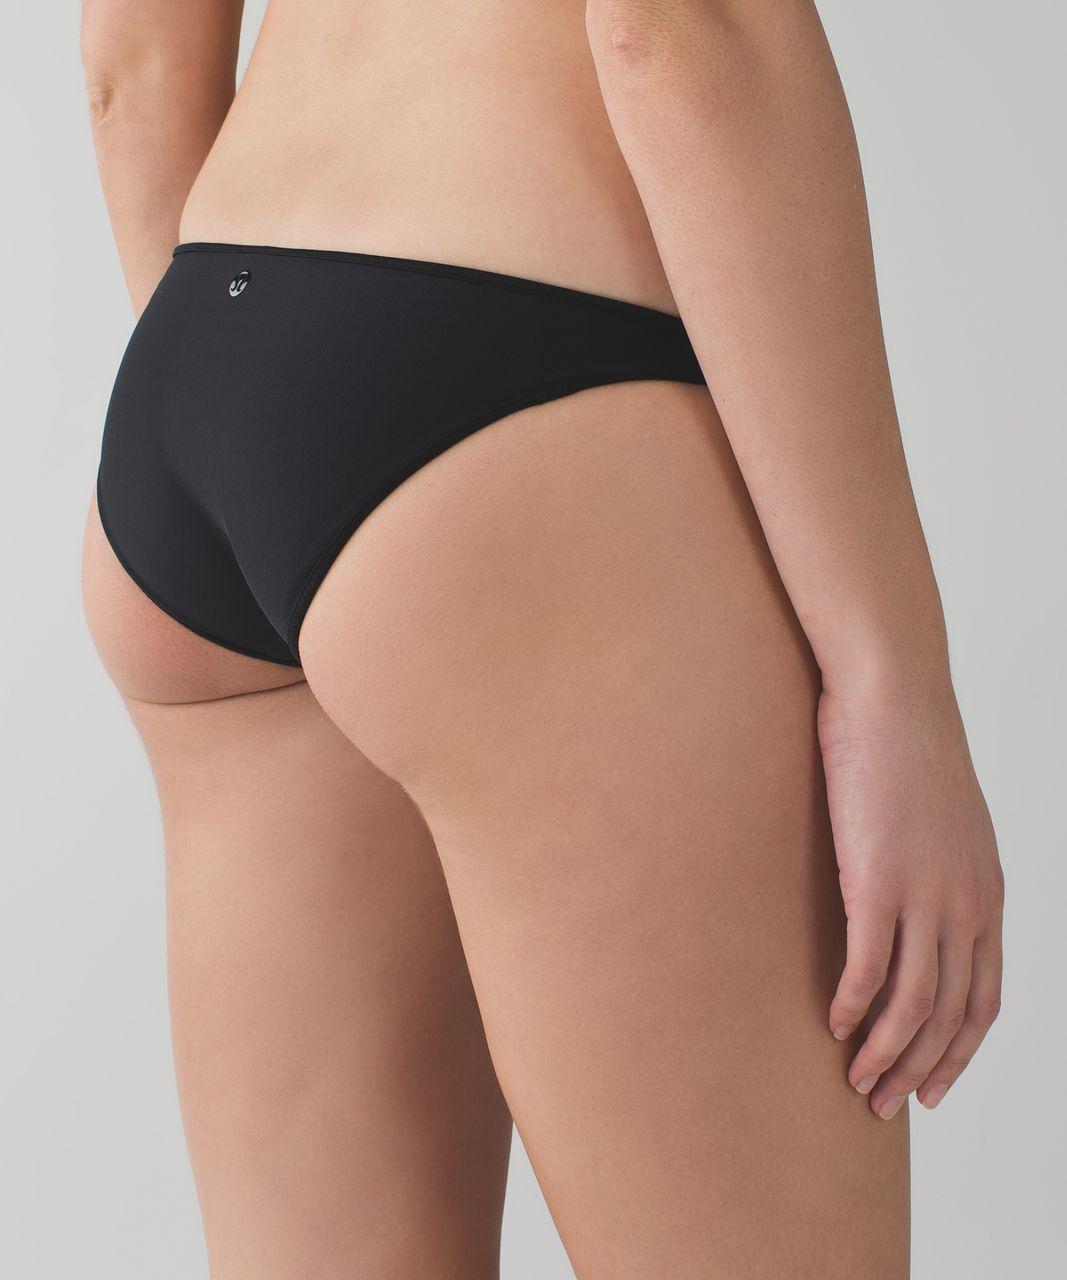 Lululemon Water:  Surf To Sand Bikini - Black / Narrow Bold Stripe Printed White Black